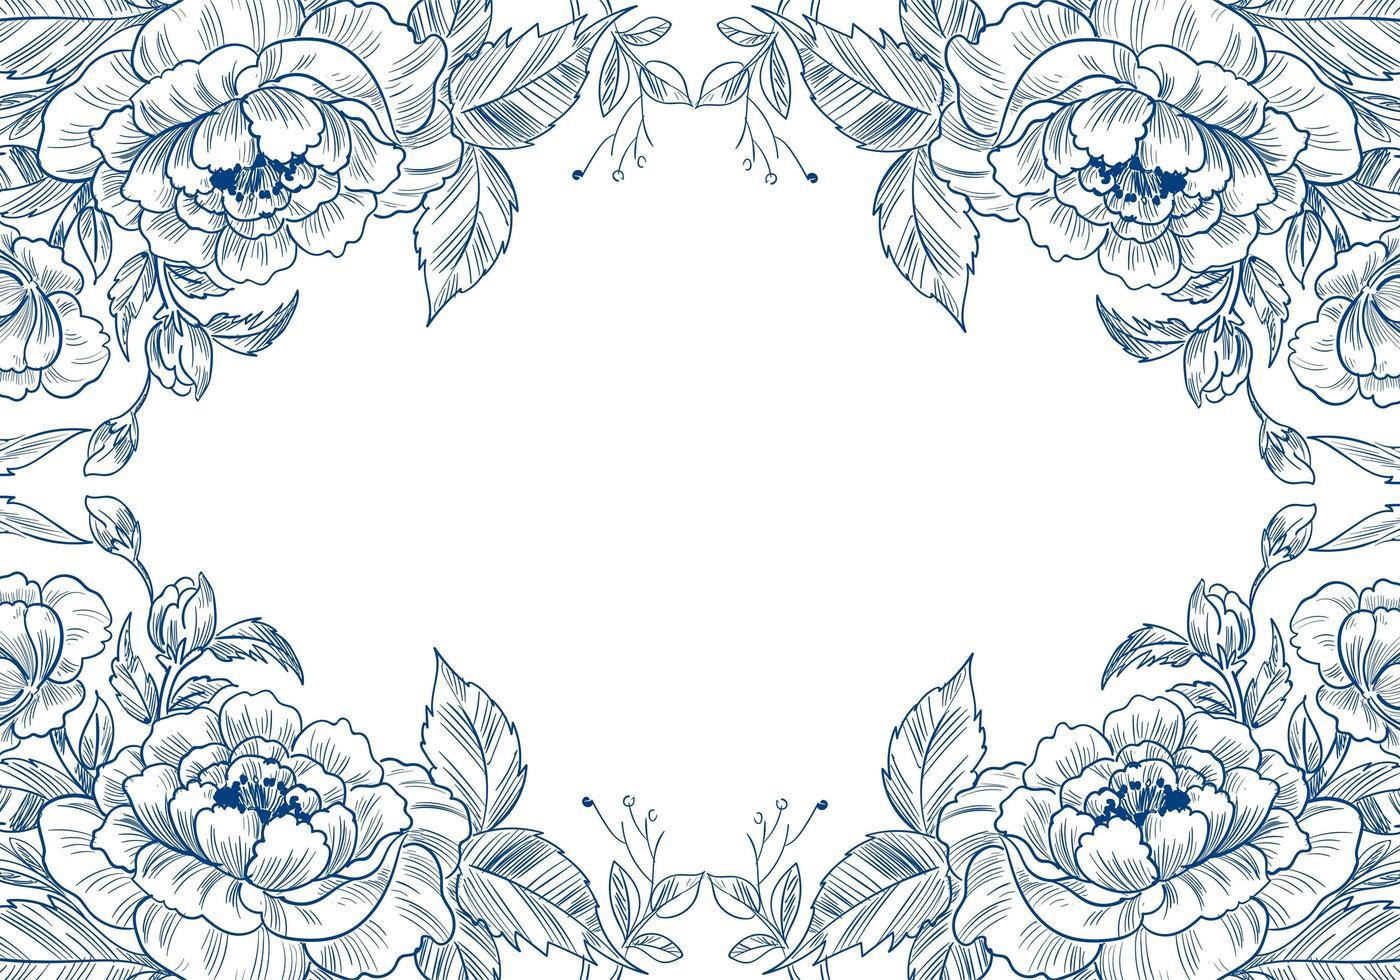 schöne dekorative Skizze Blumenrahmen vektor